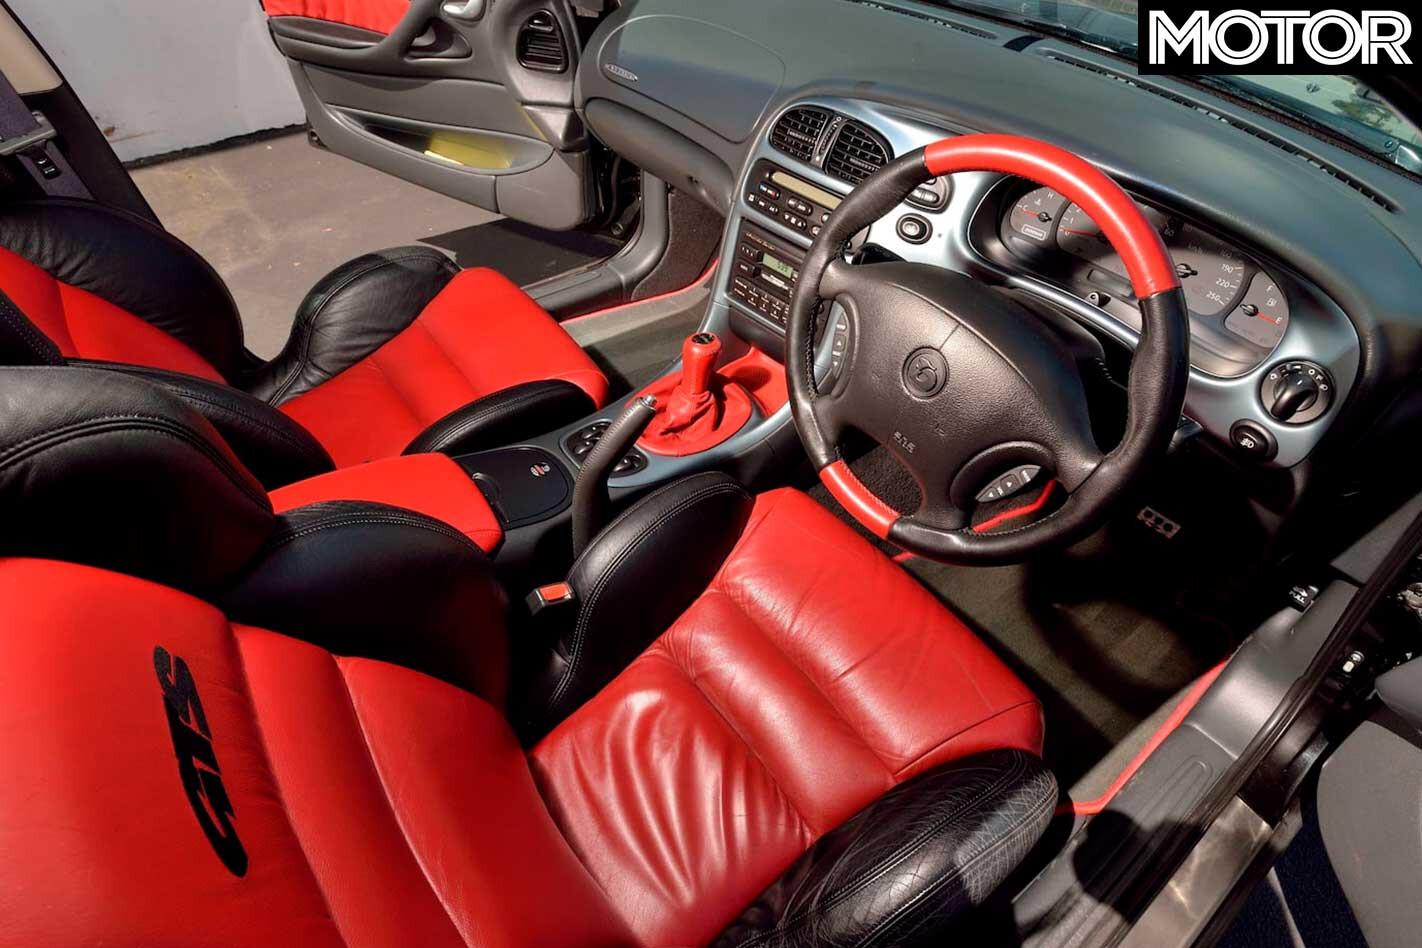 2000 HSV VTII GTS R Mecum Auction Interior Jpg